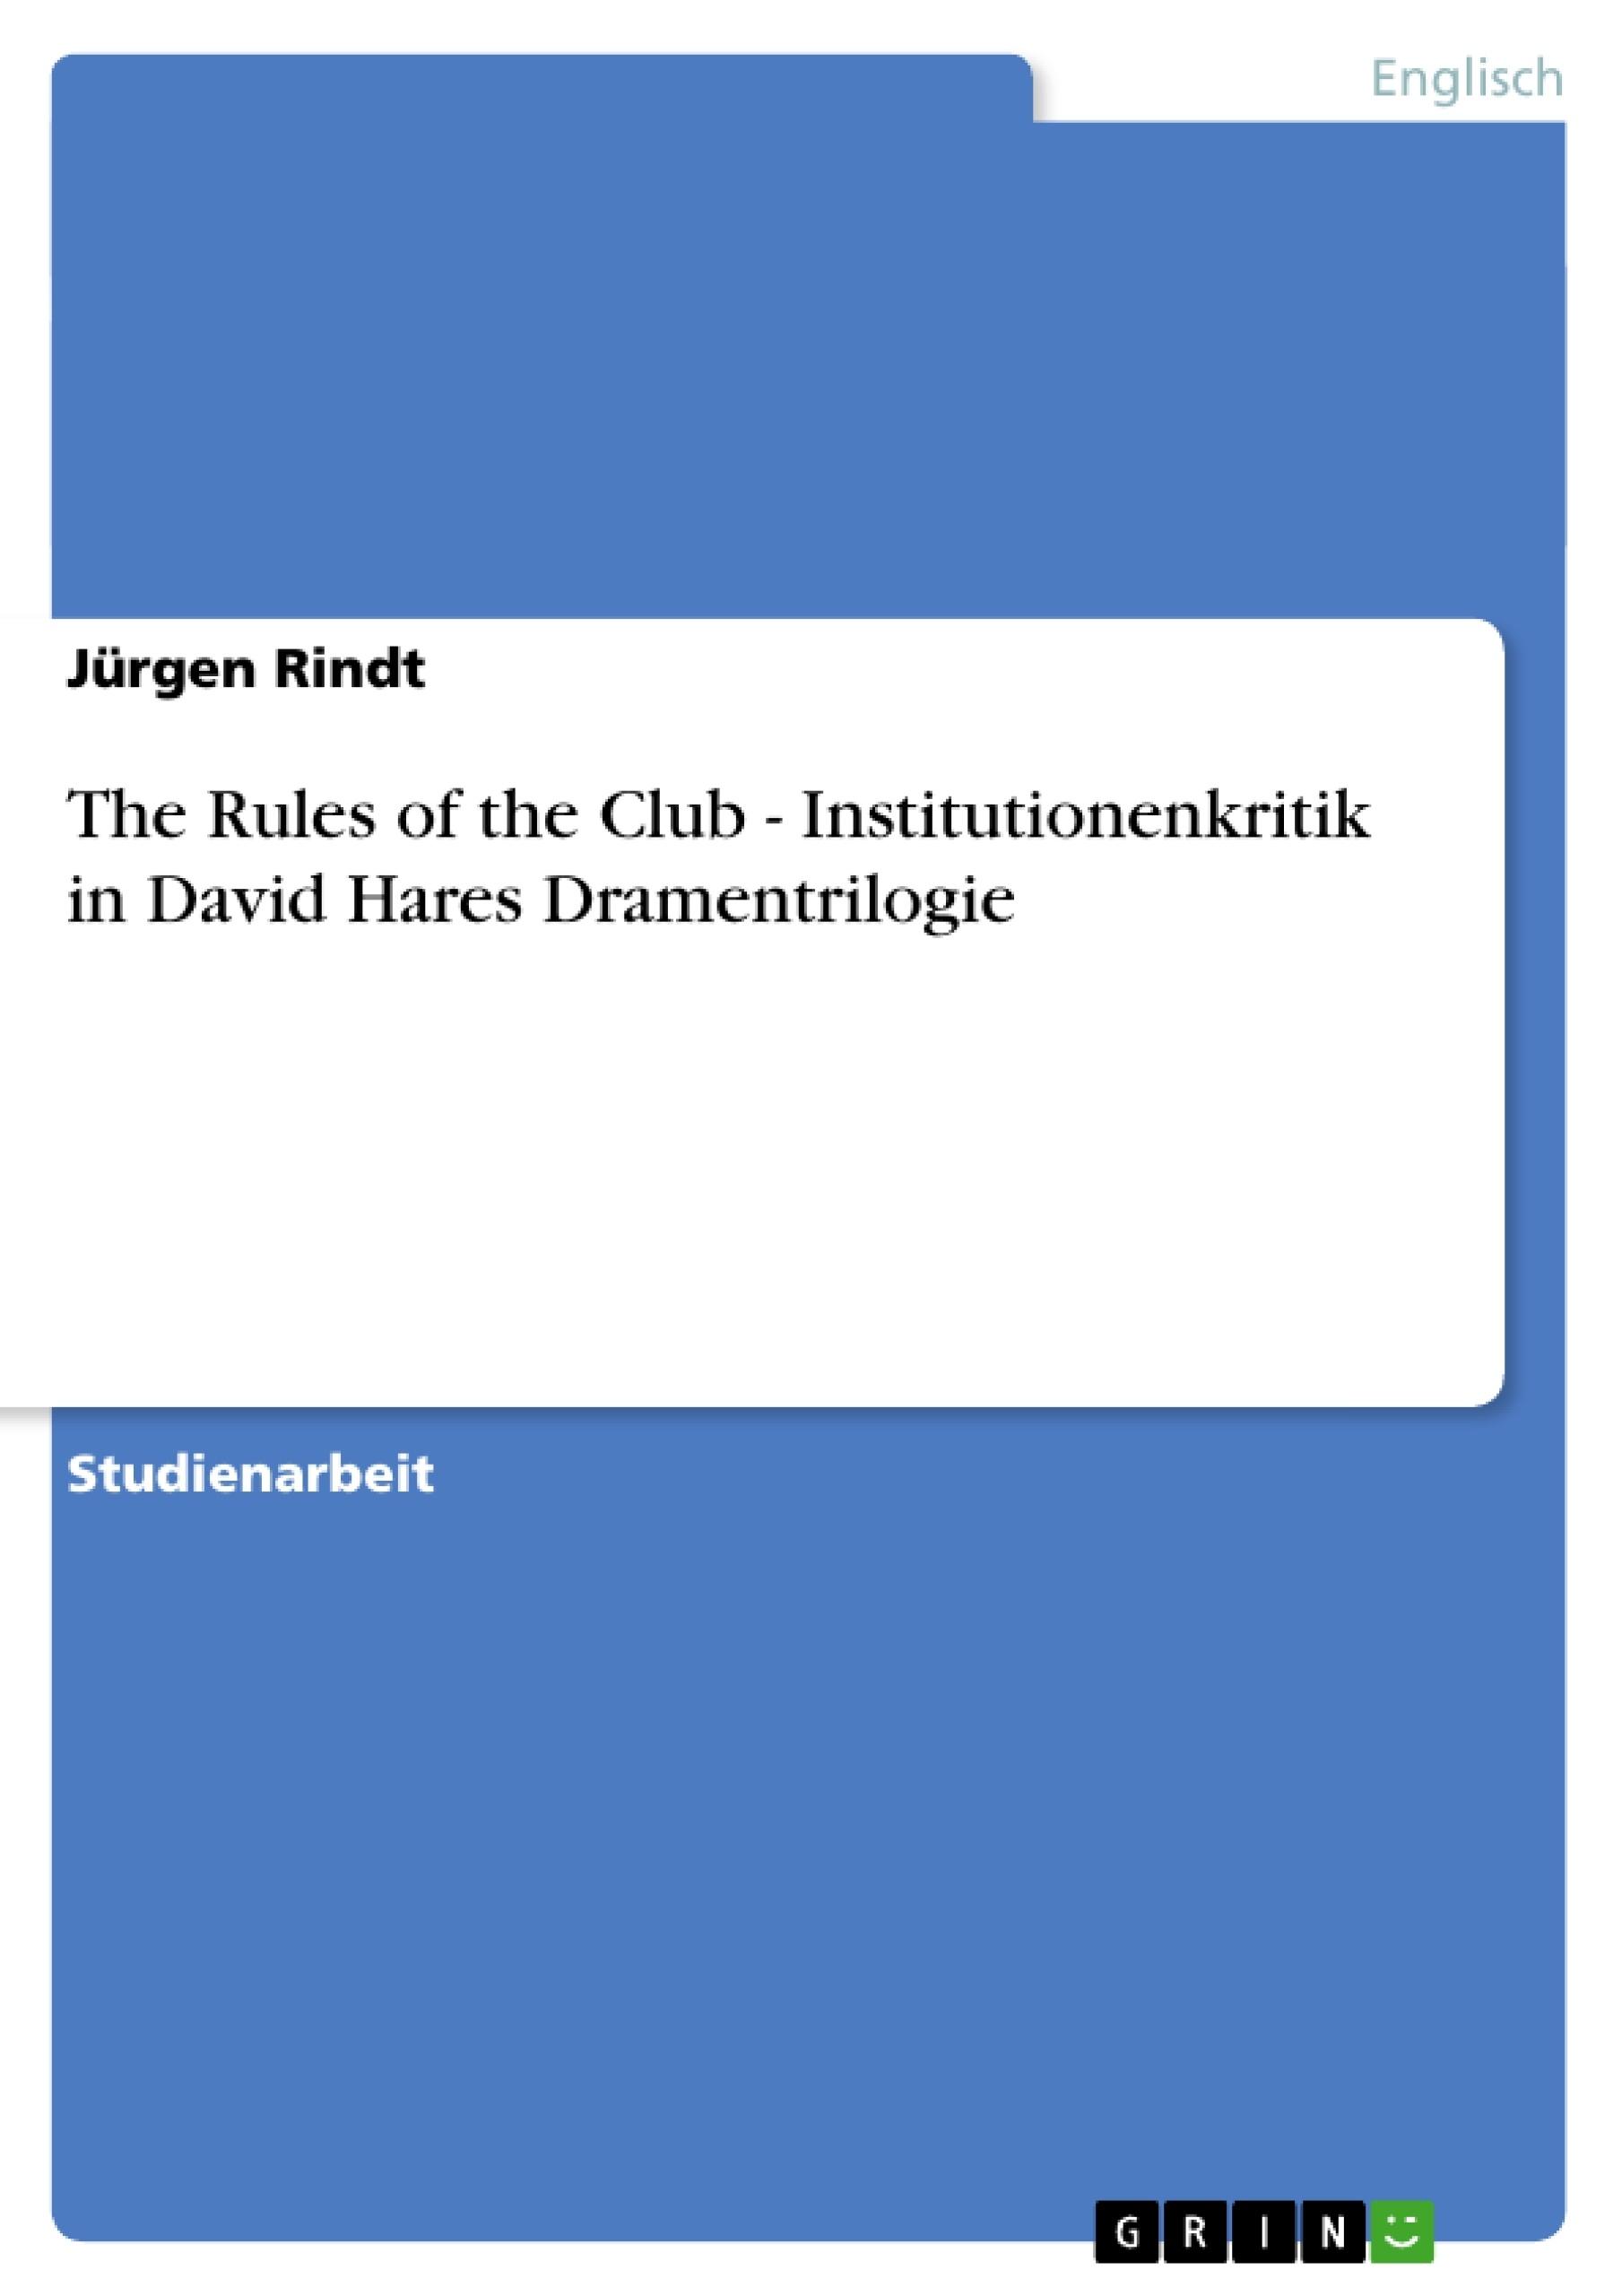 Titel: The Rules of the Club - Institutionenkritik in David Hares Dramentrilogie